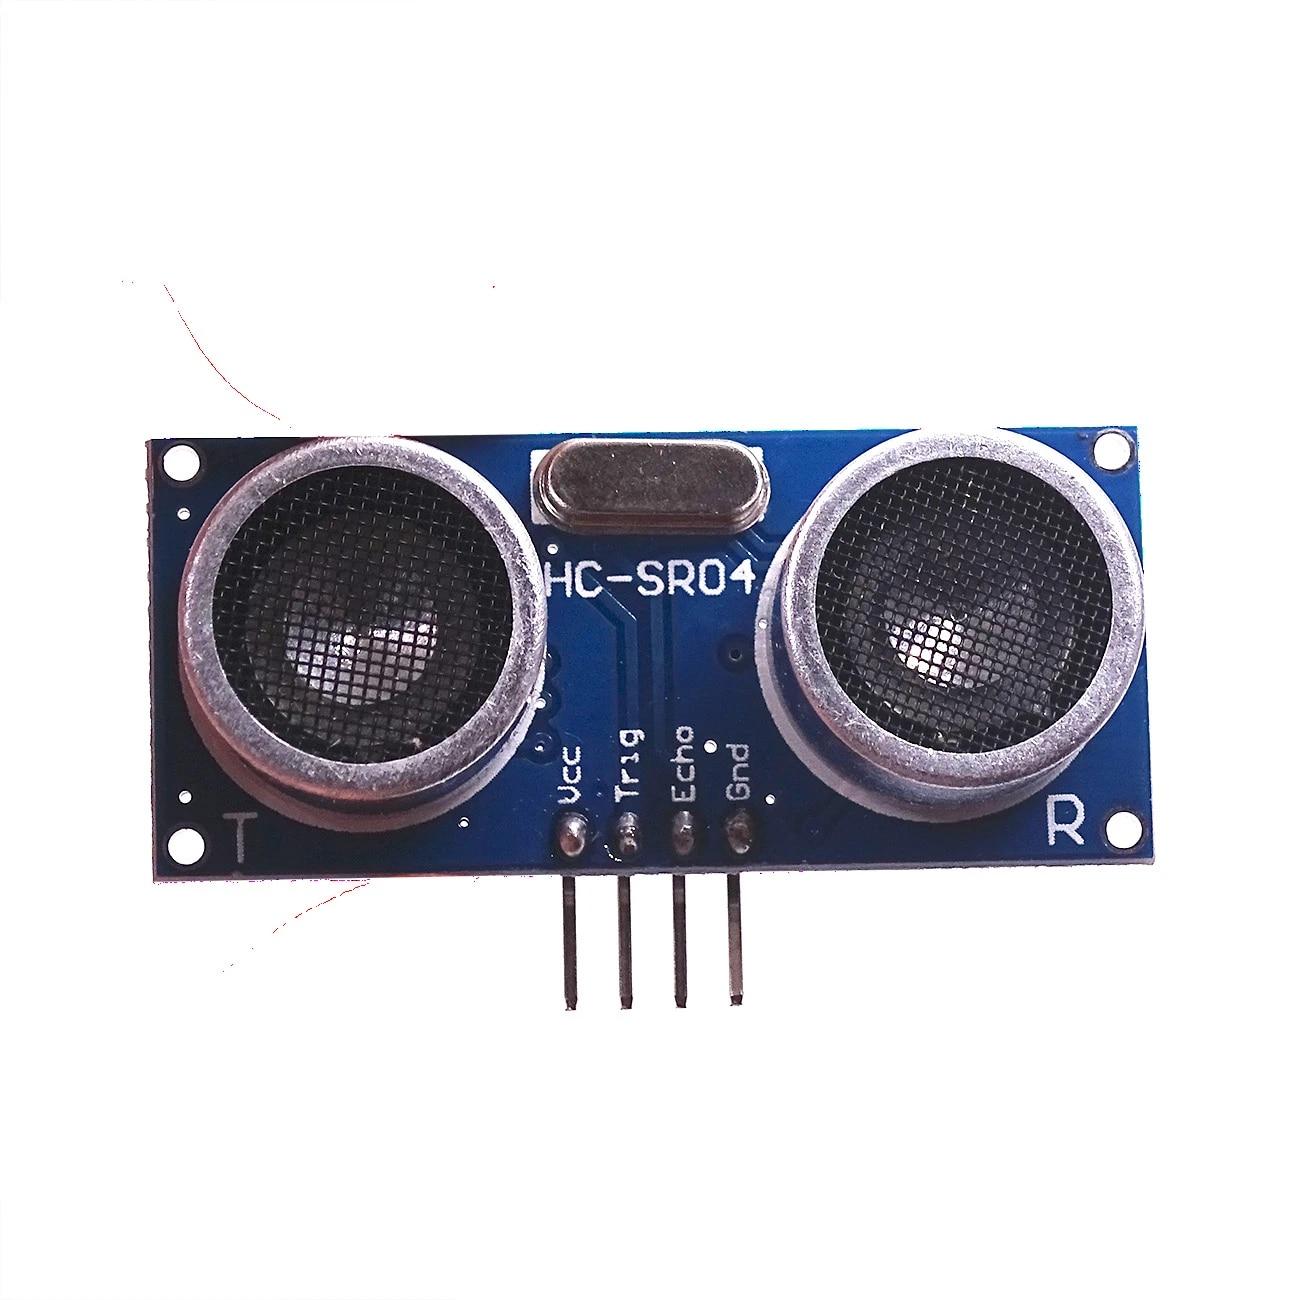 HITSAN 10Pcs Geekcreit Ultrasonic Module HC-SR04 Distance Measuring Ranging Transducer Sensor DC5V 2-450cm One Piece